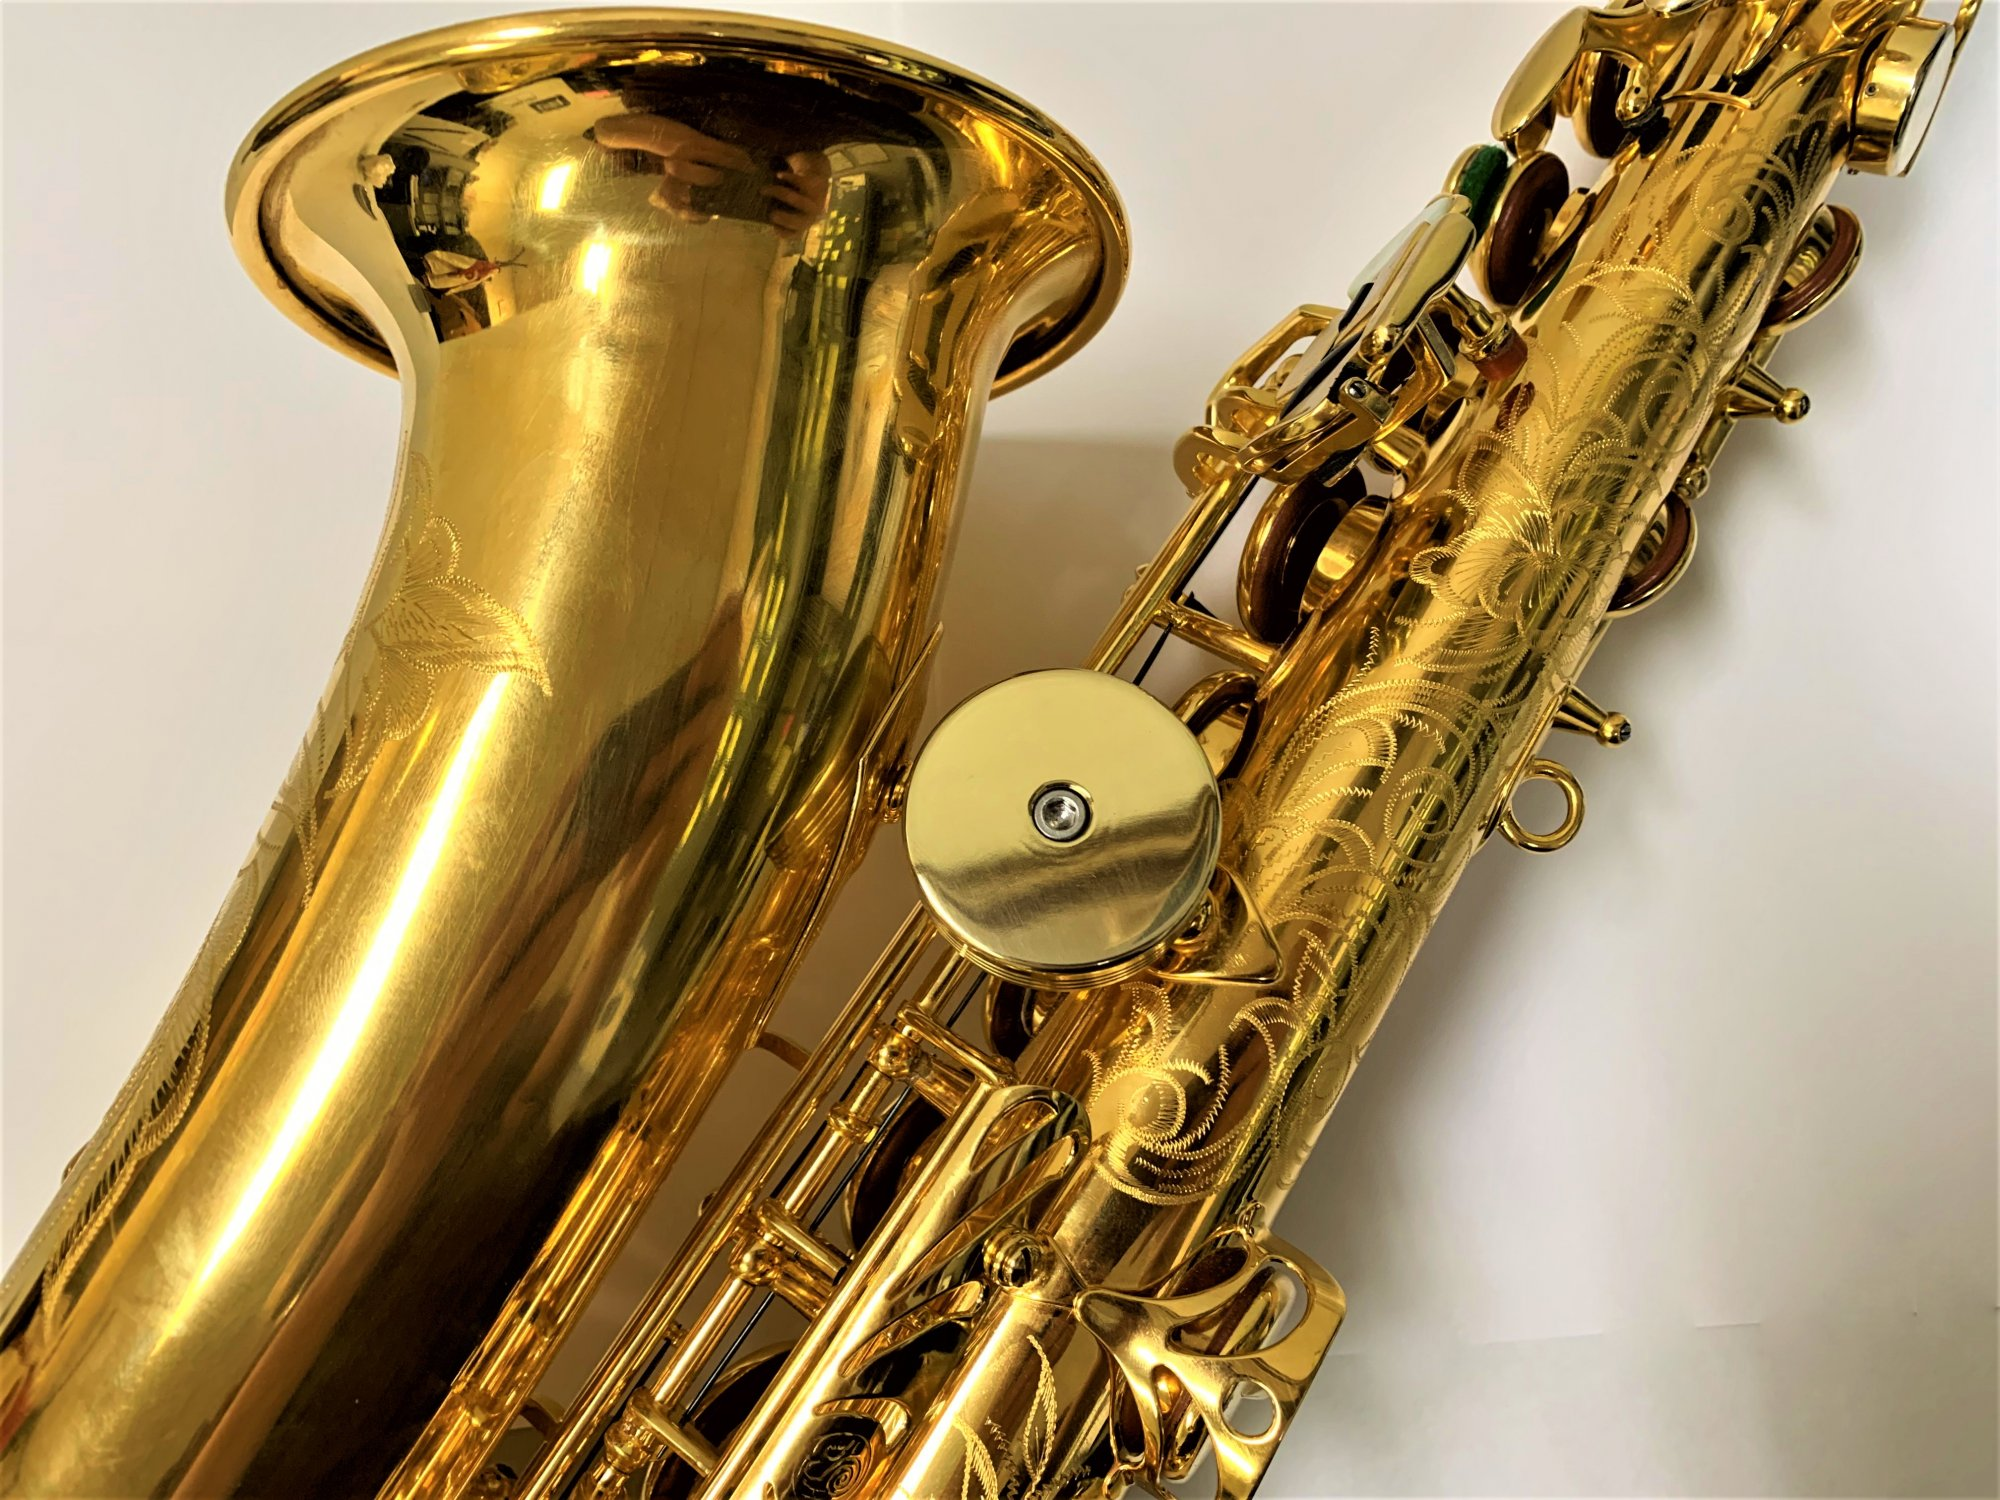 Center Brace Resonance Weights for Mark VI Saxophones